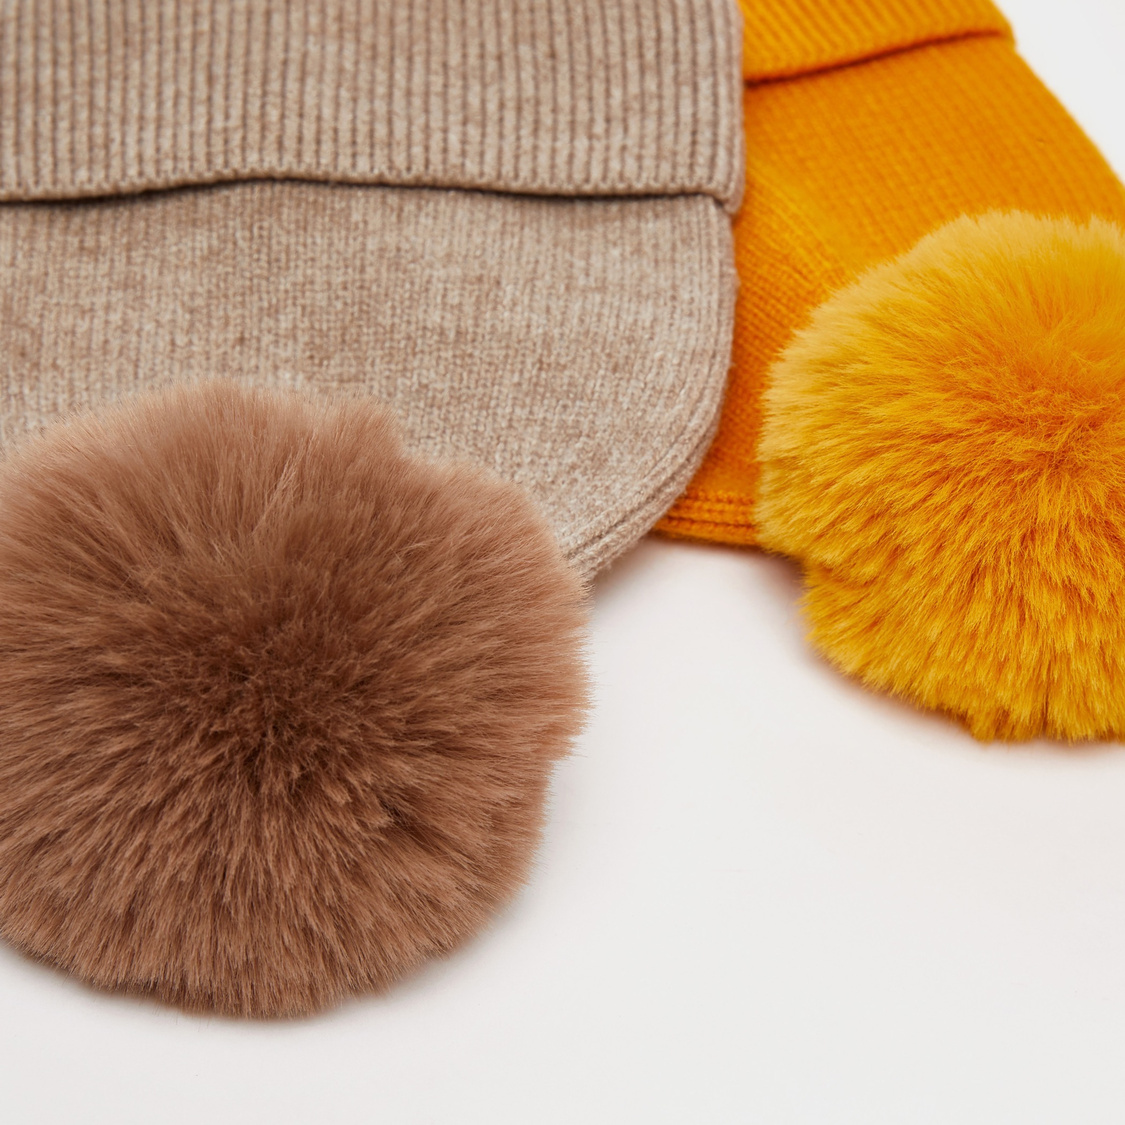 Set of 2 - Textured Beanie Cap with Pom Pom Detail